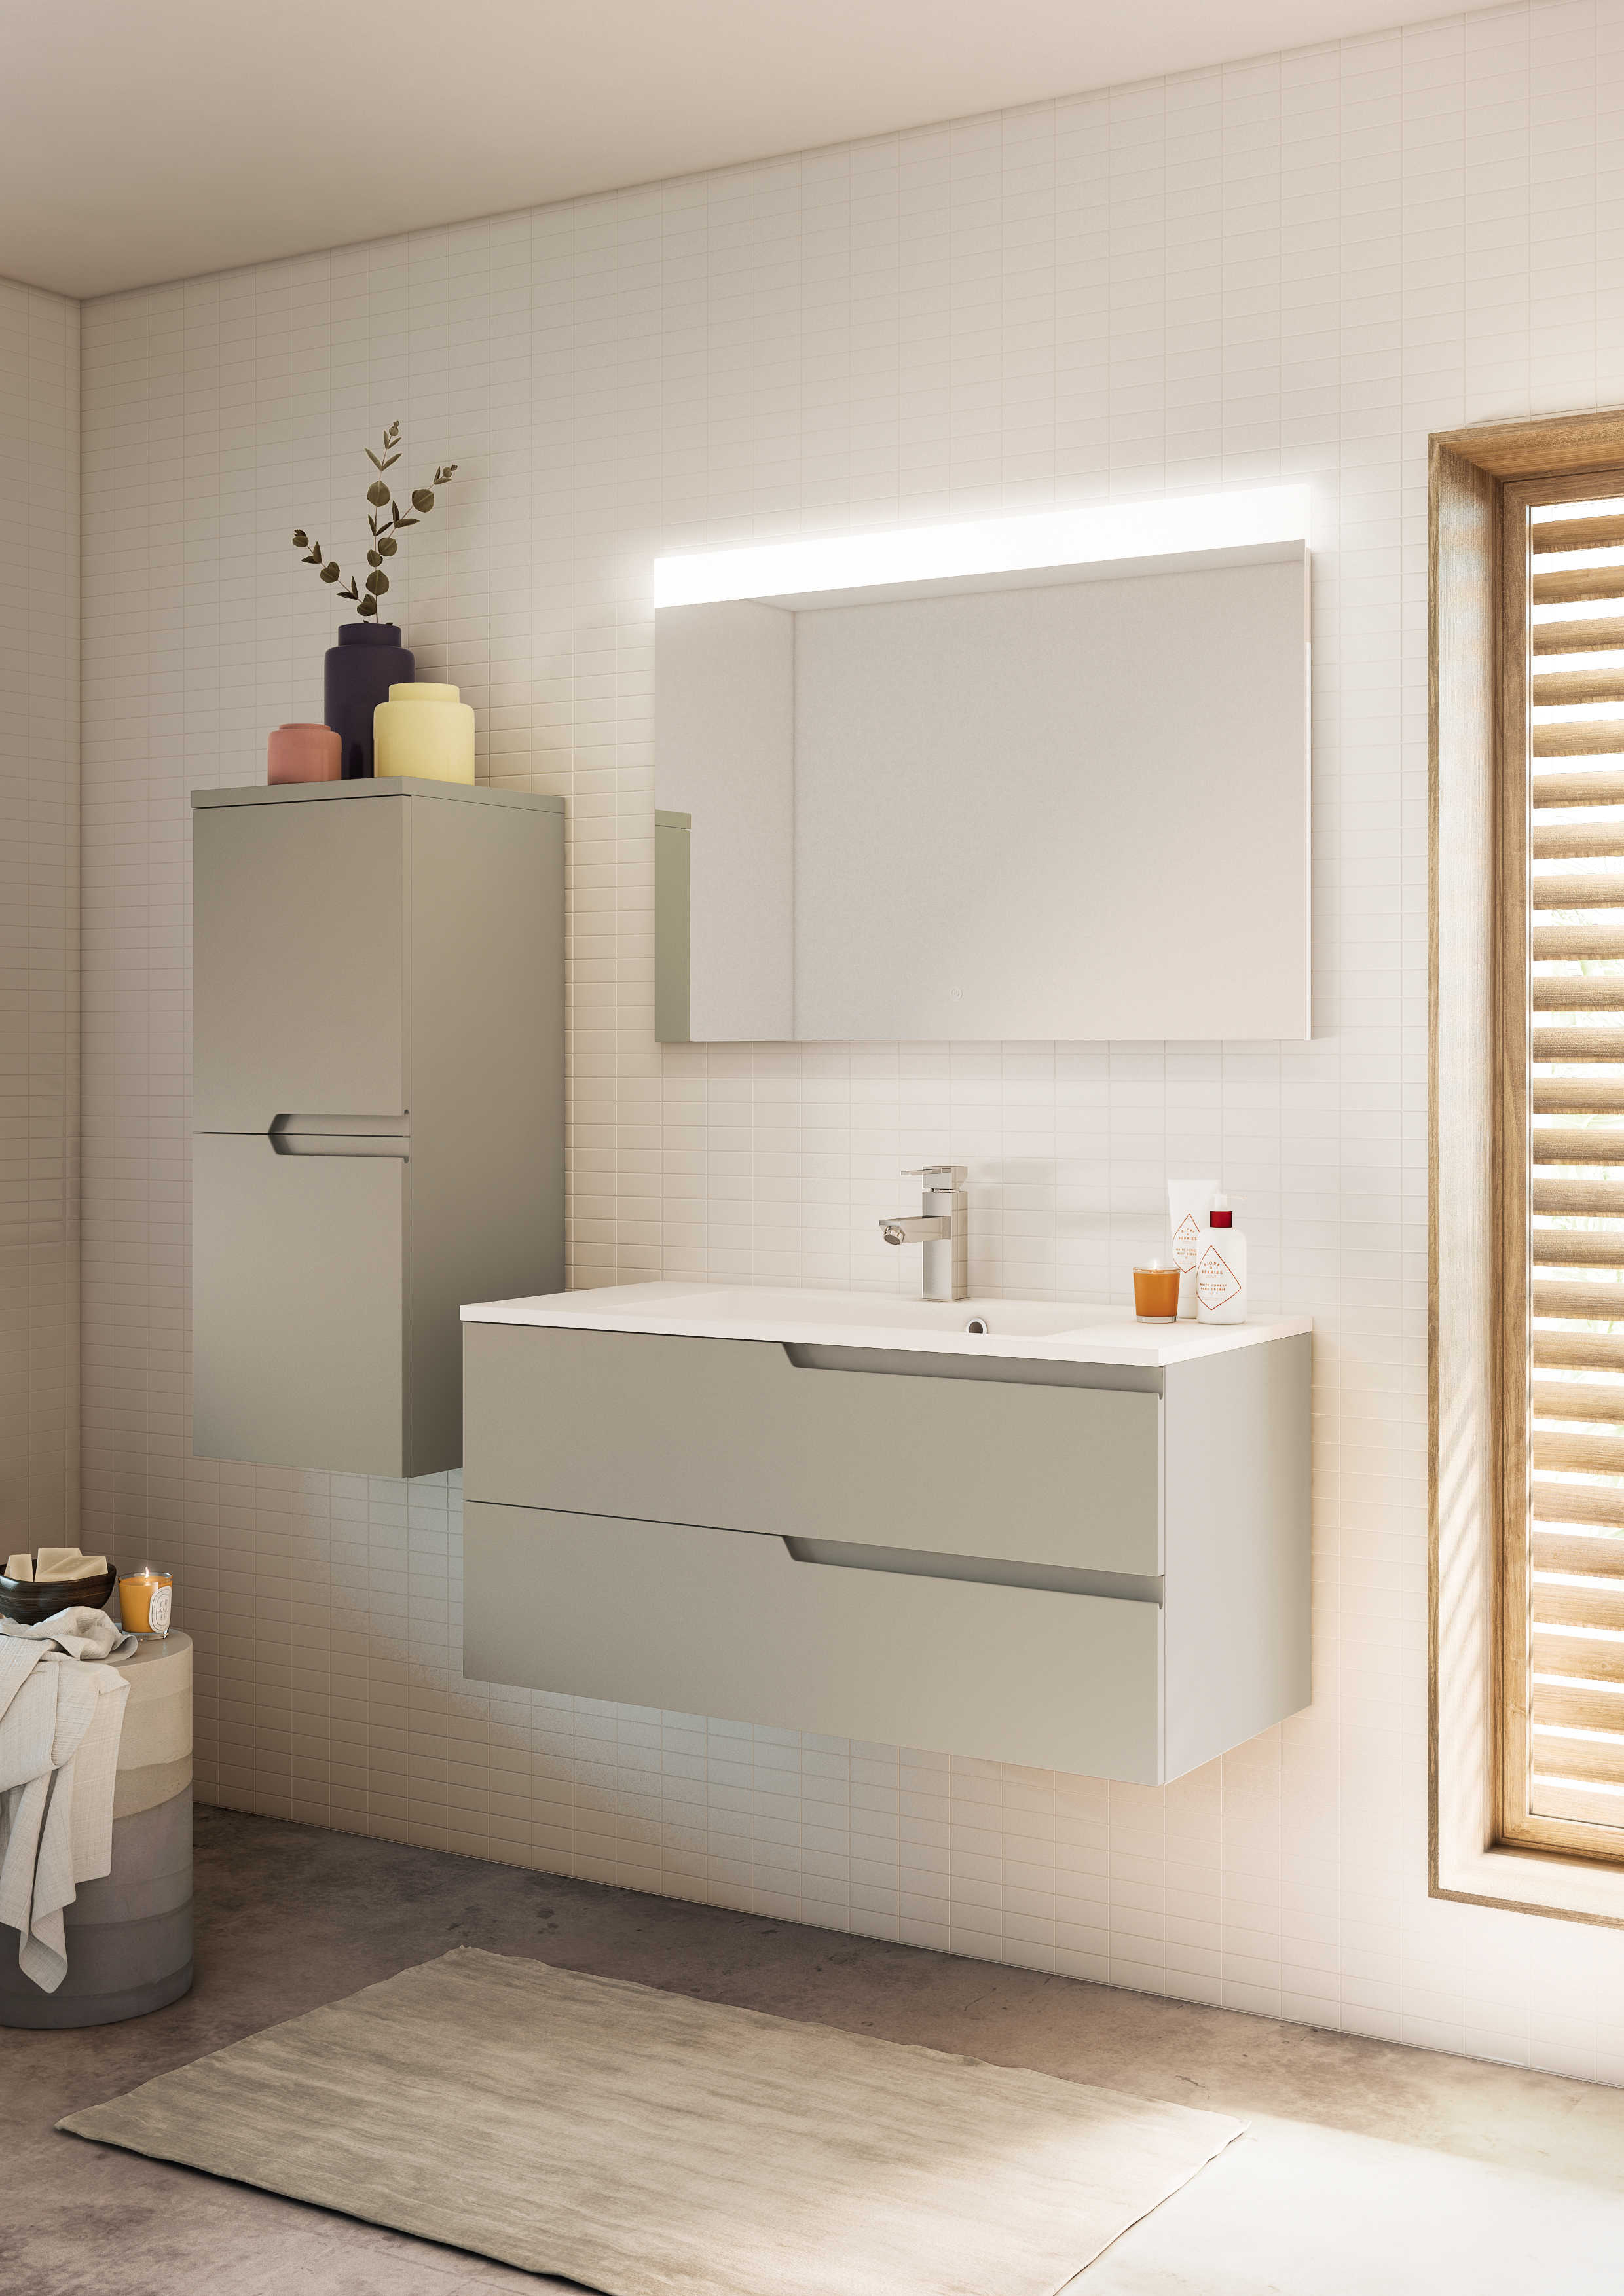 Salle De Bain Parement Baignoire ~ meuble salle de bain aquarine excellent meuble salle de bain